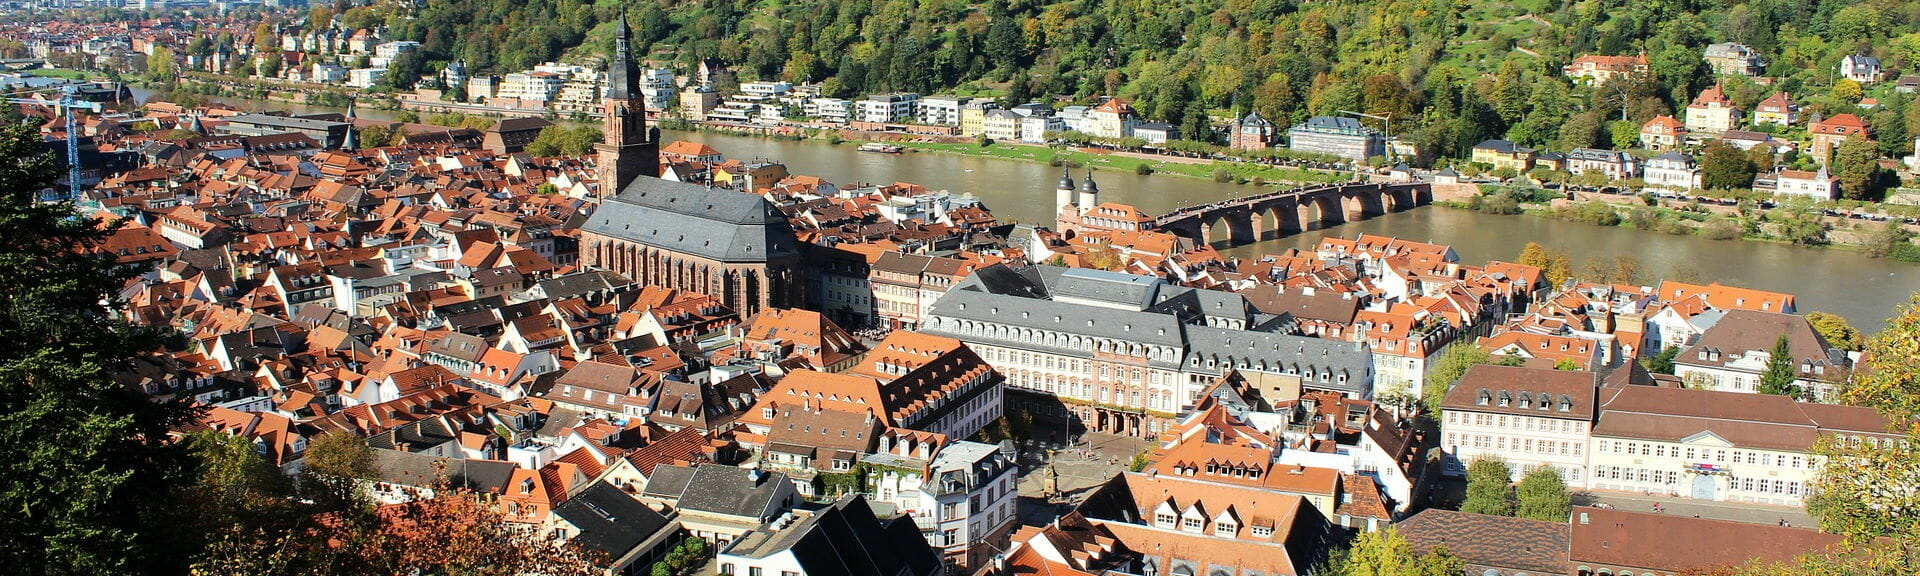 Klassenfahrt Heidelberg Stadtansicht